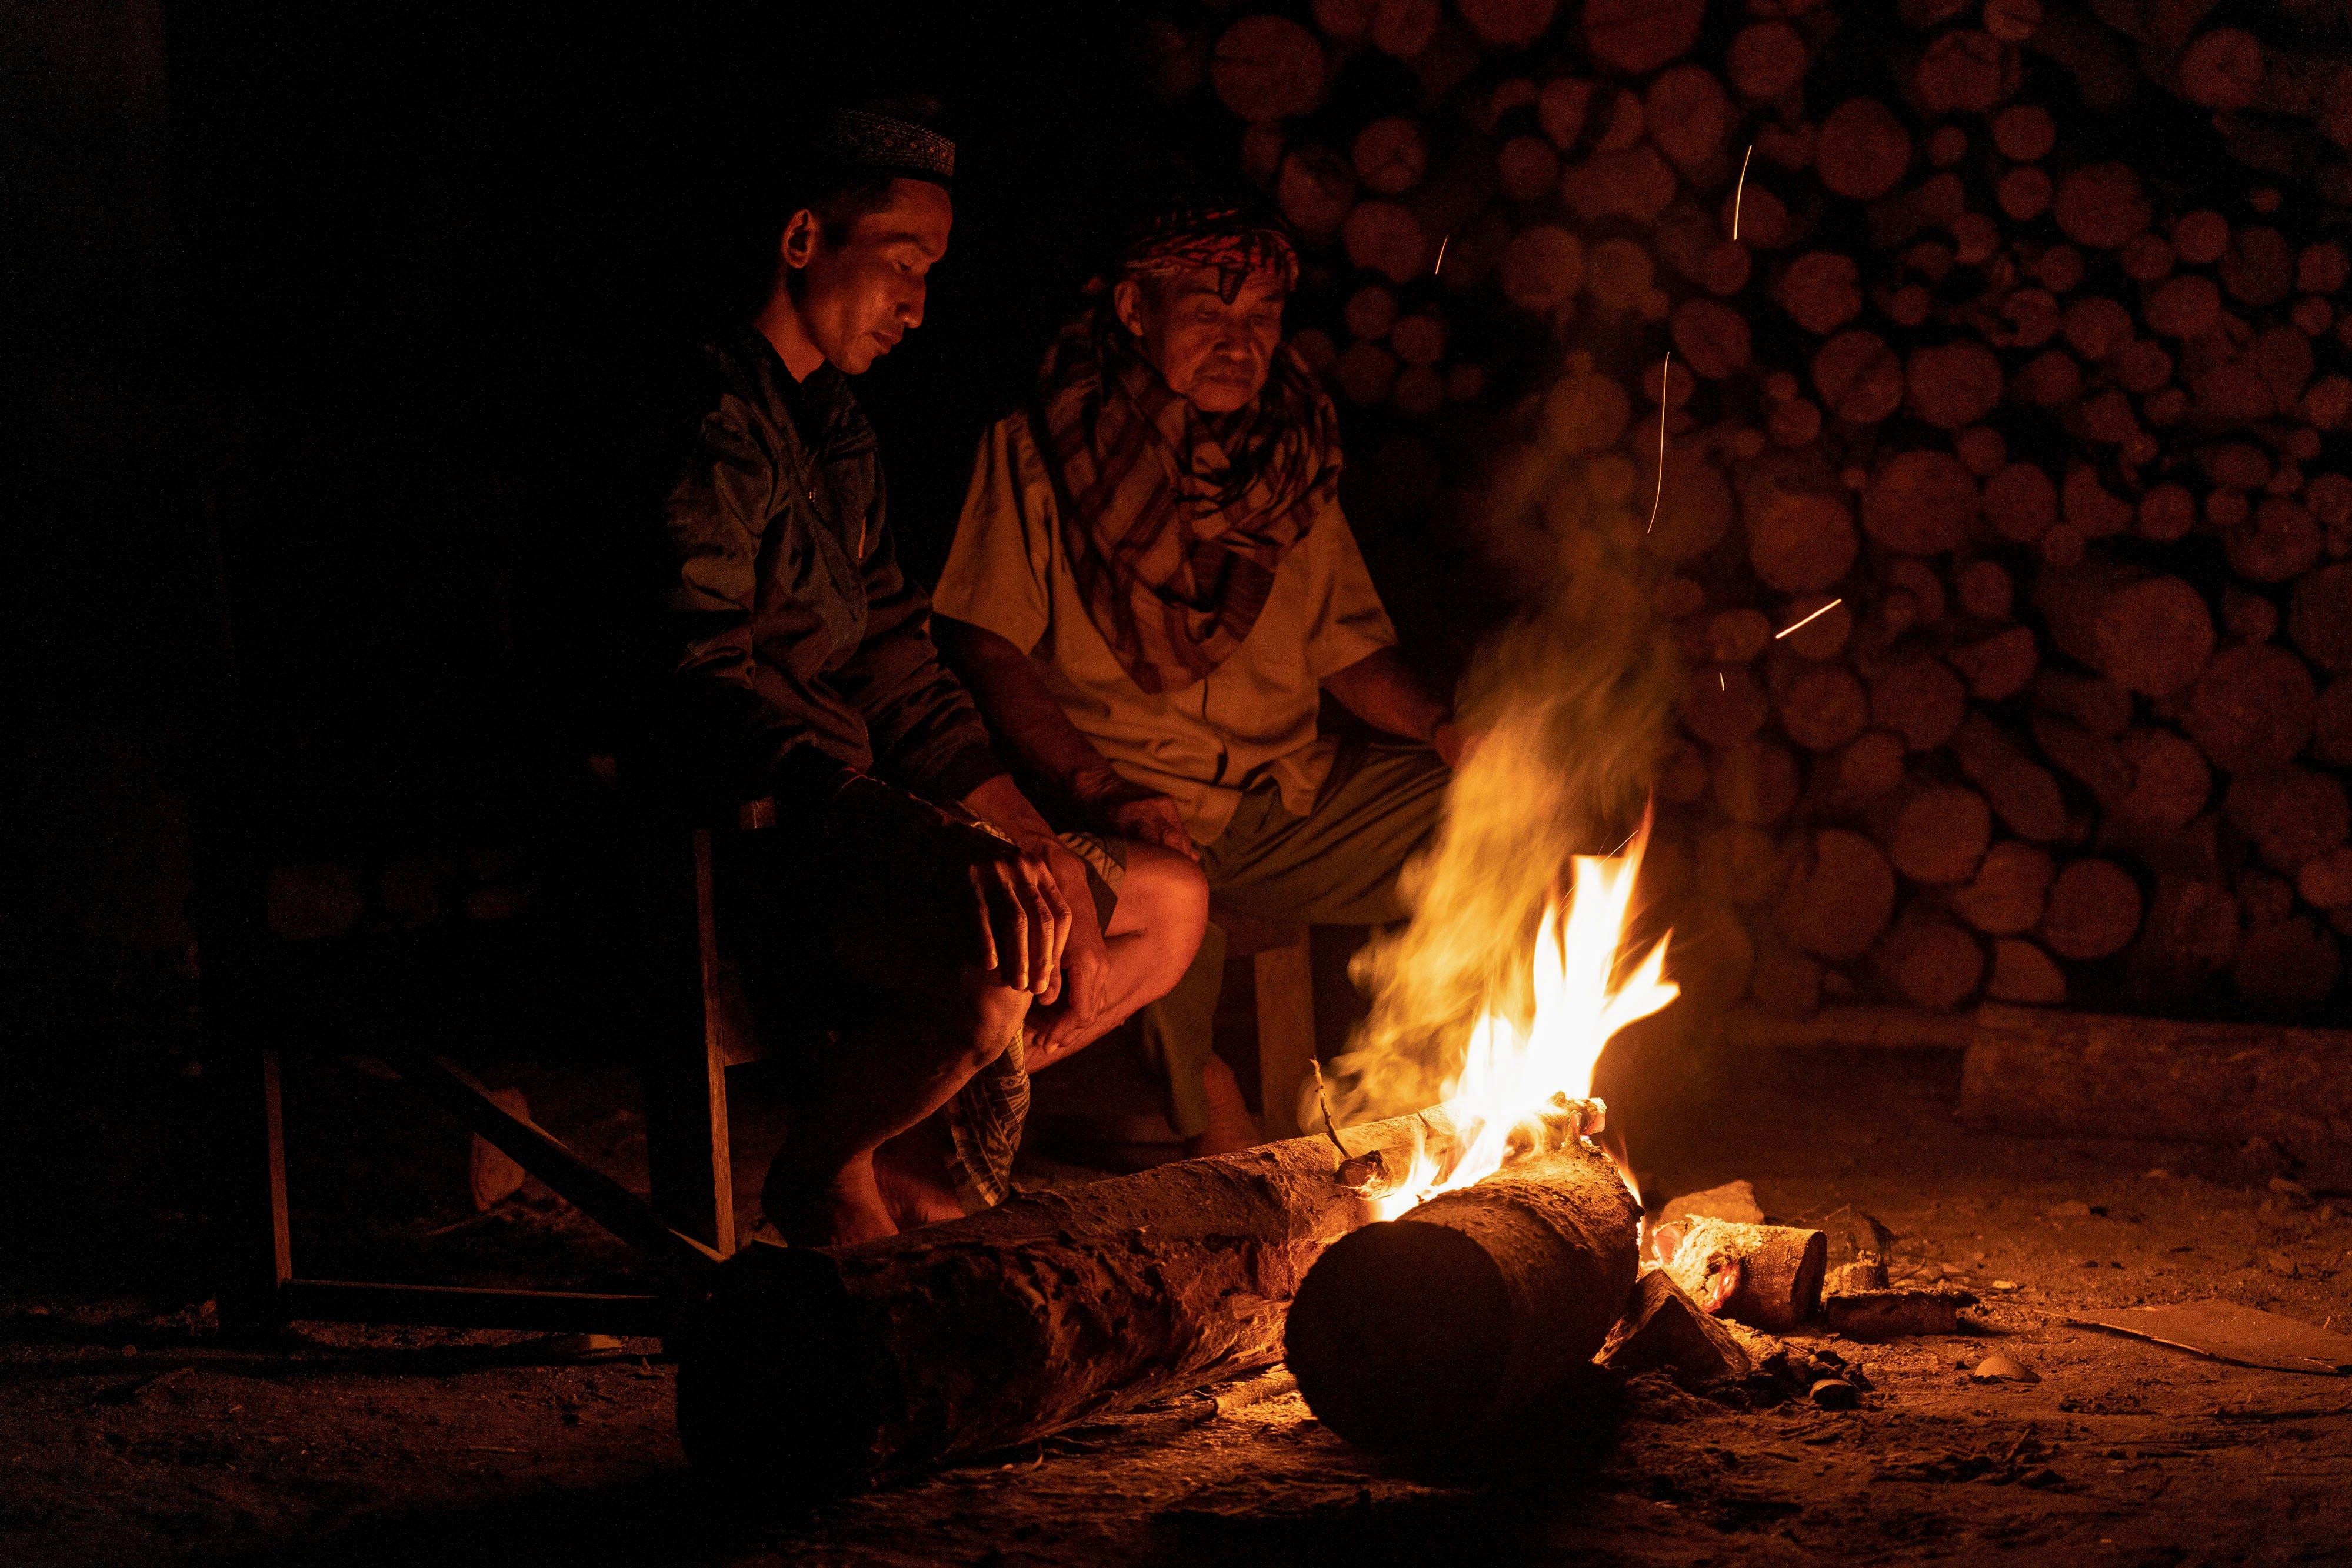 Dua warga duduk di depan api unggun saat meronda di Ngrangkah, Umbulharjo, Cangkringan, Sleman, DI Yogyakarta.